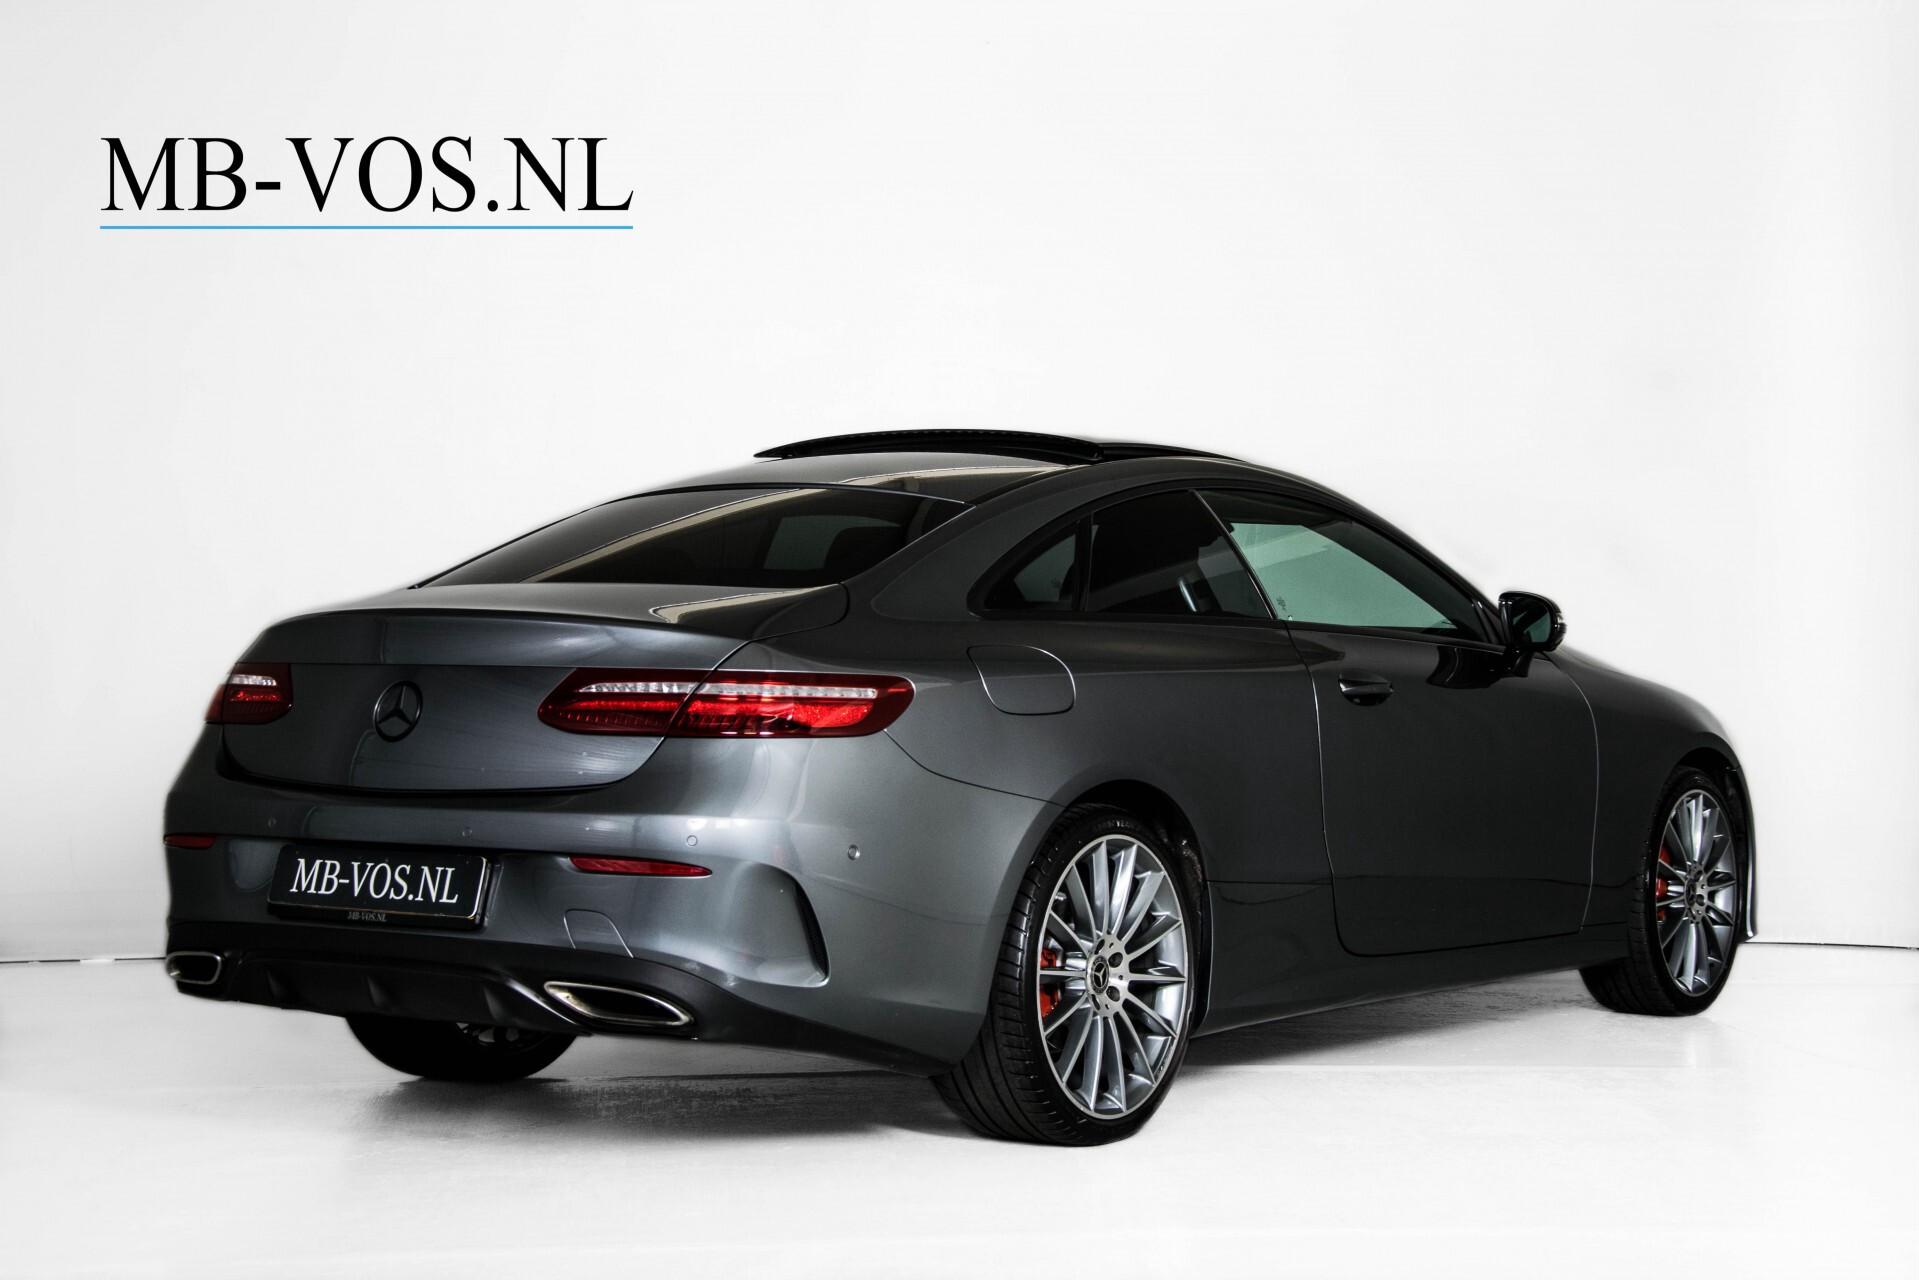 Mercedes-Benz E-Klasse Coupé 300 AMG Luchtvering/Distronic/Keyless/Designo/Burmester/Stoelkoeling Aut7 Foto 2